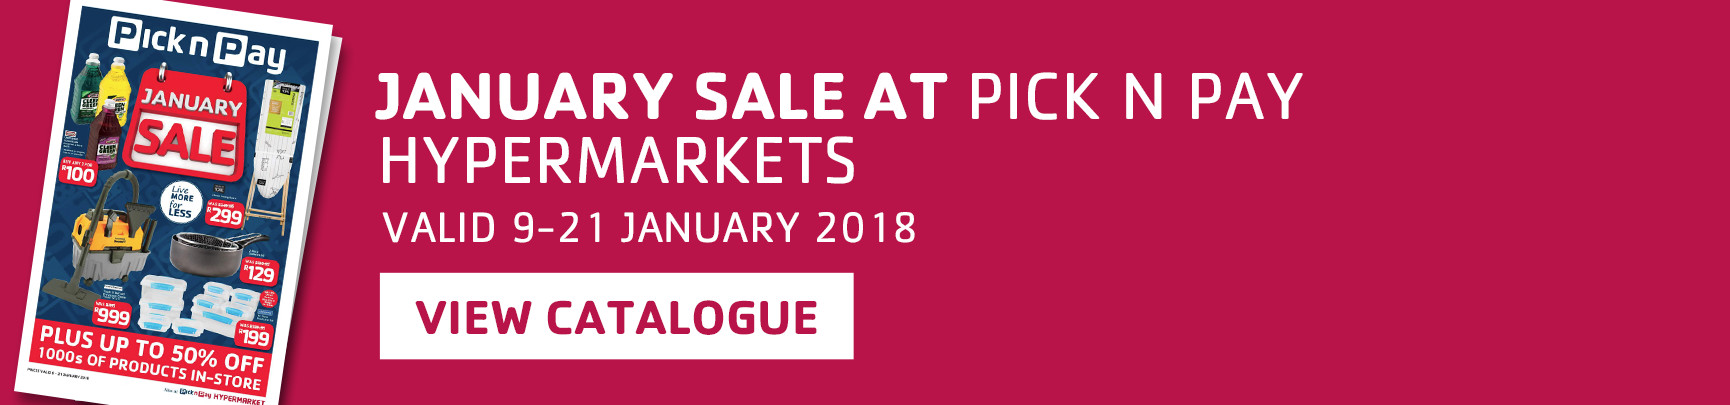 JANUARY SALE AT PICK N PAY HYPERMARKETS 2018.jpg